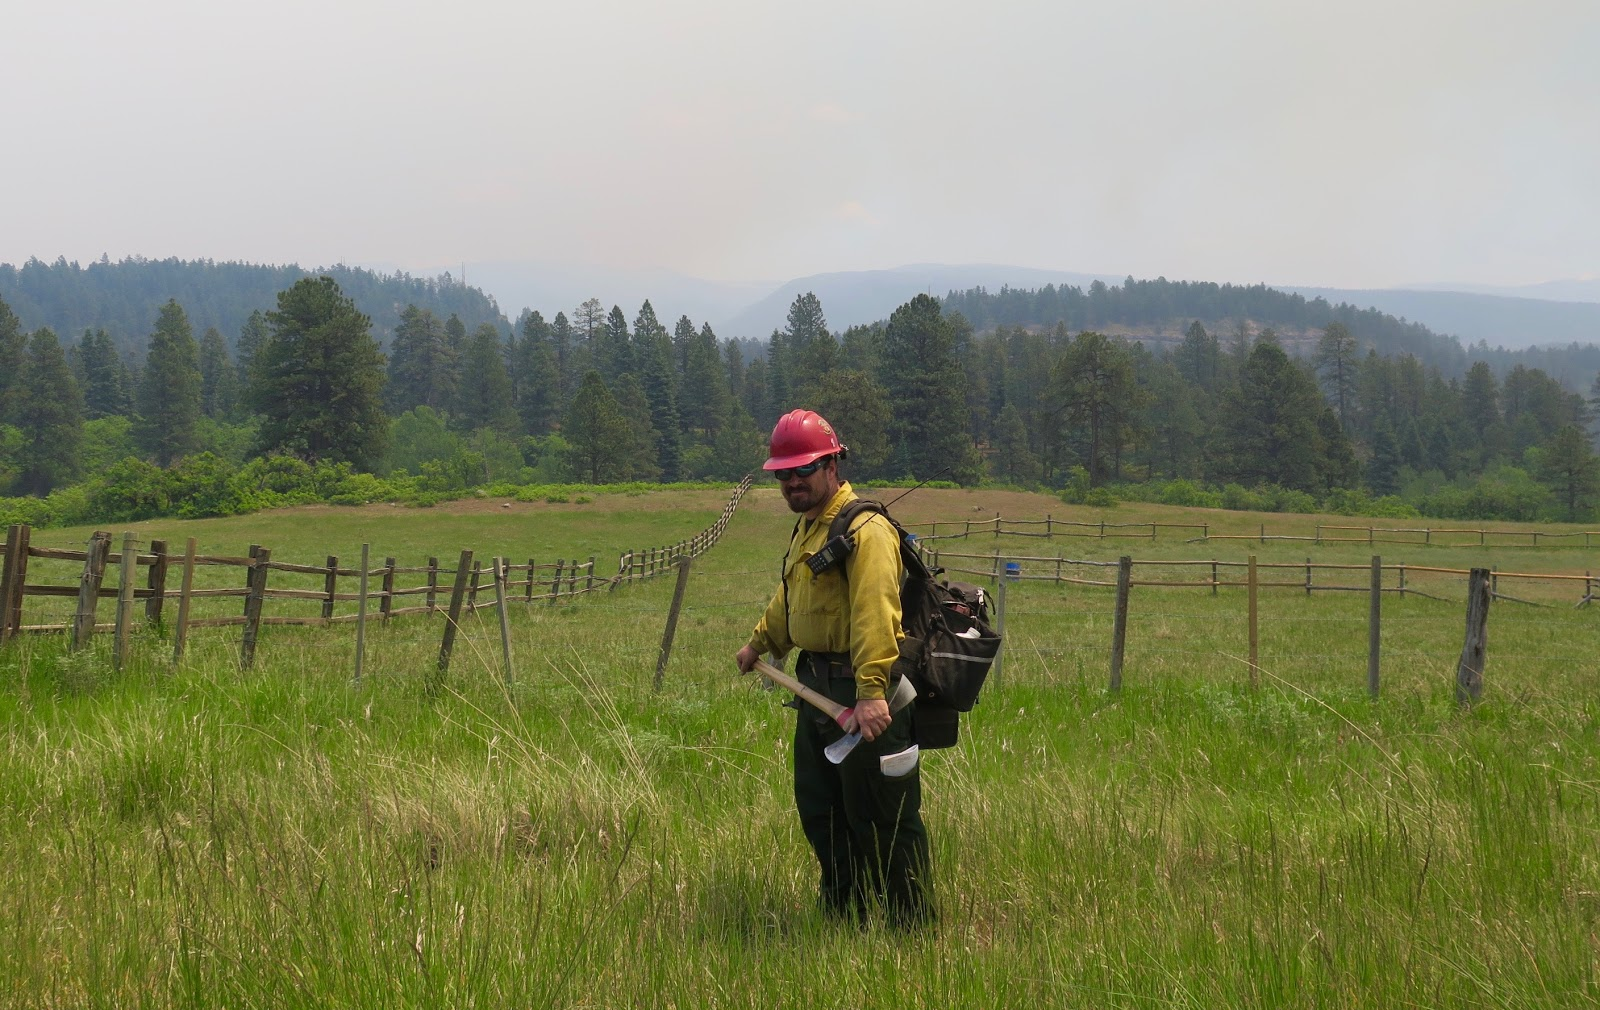 416 firefighter, photo by Priscilla Sherman